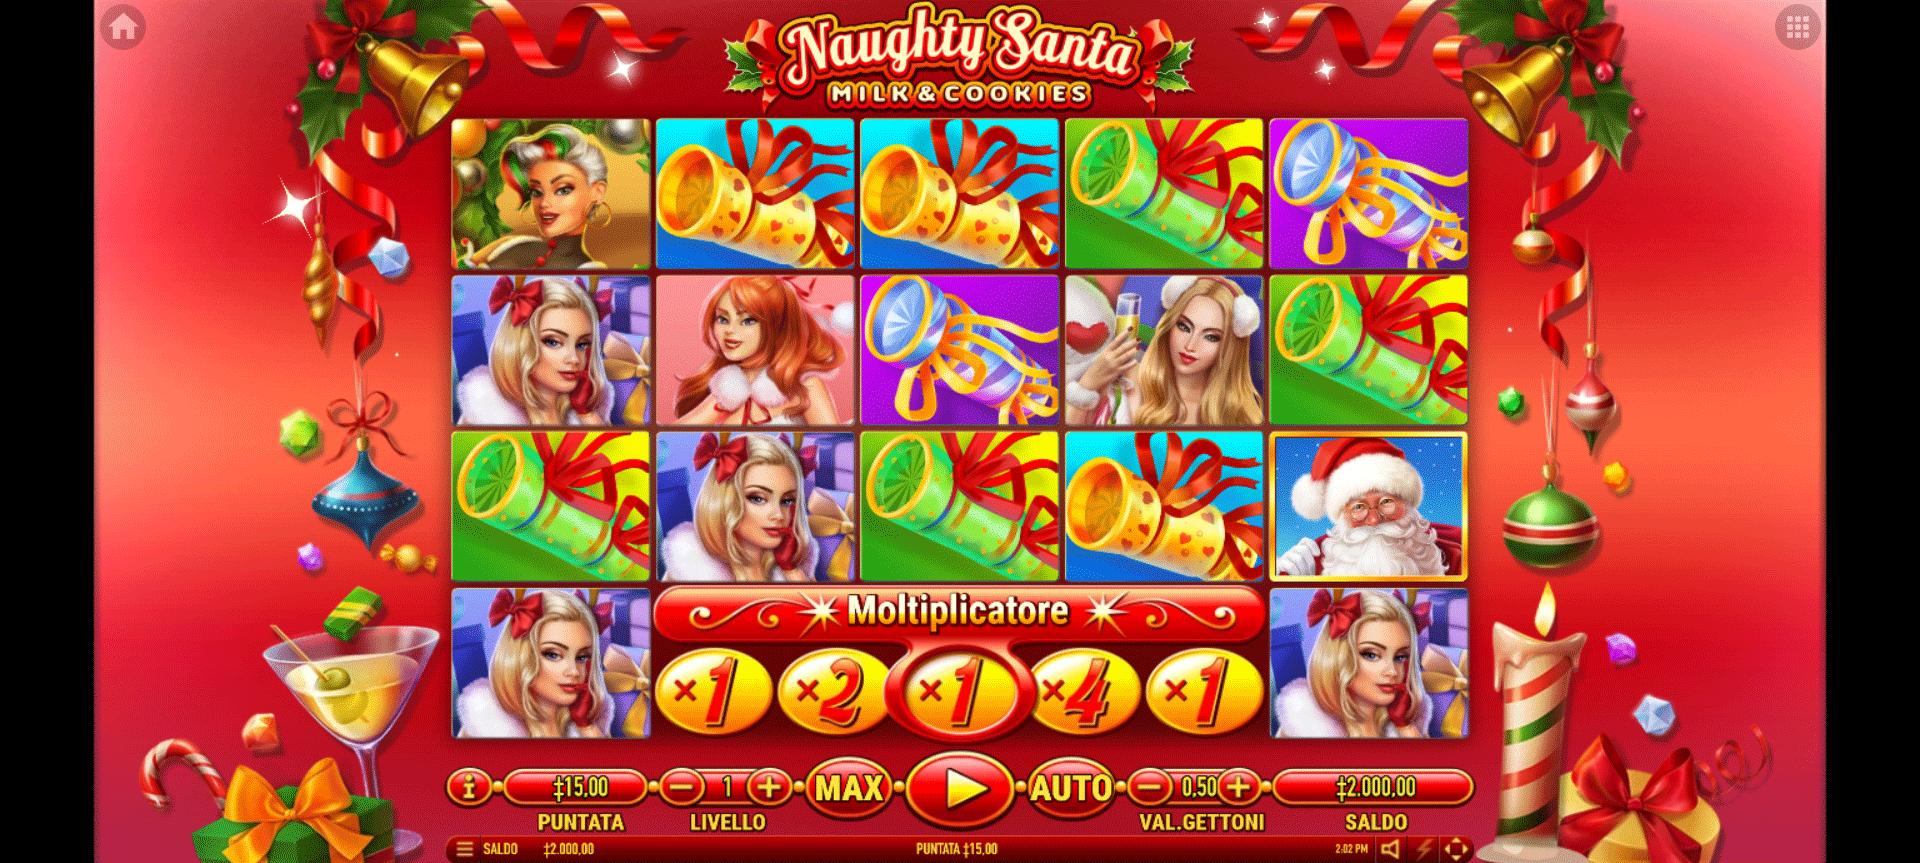 Slot Naughty Santa